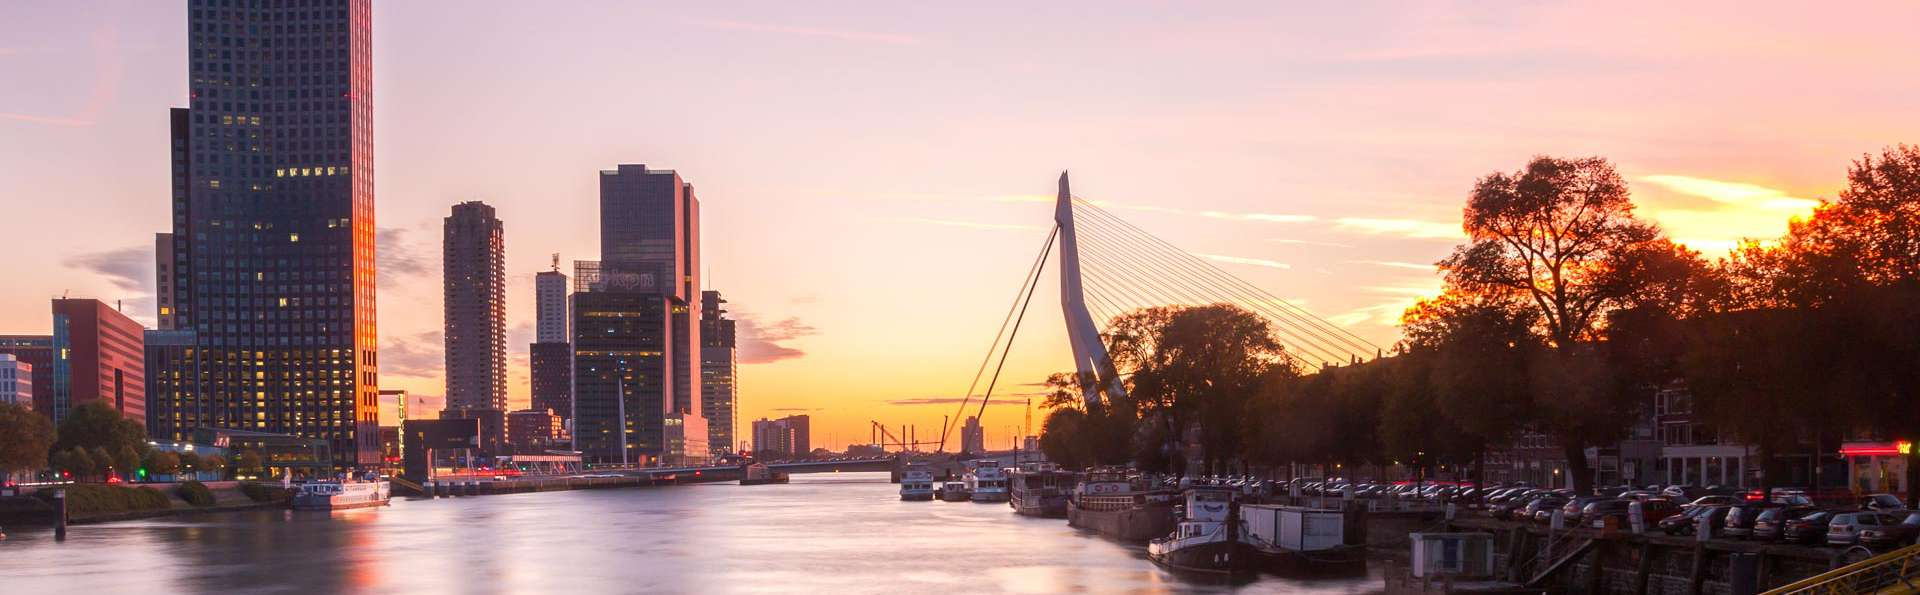 Ibis Rotterdam City Center - EDIT_ROTTERDAM_07.jpg